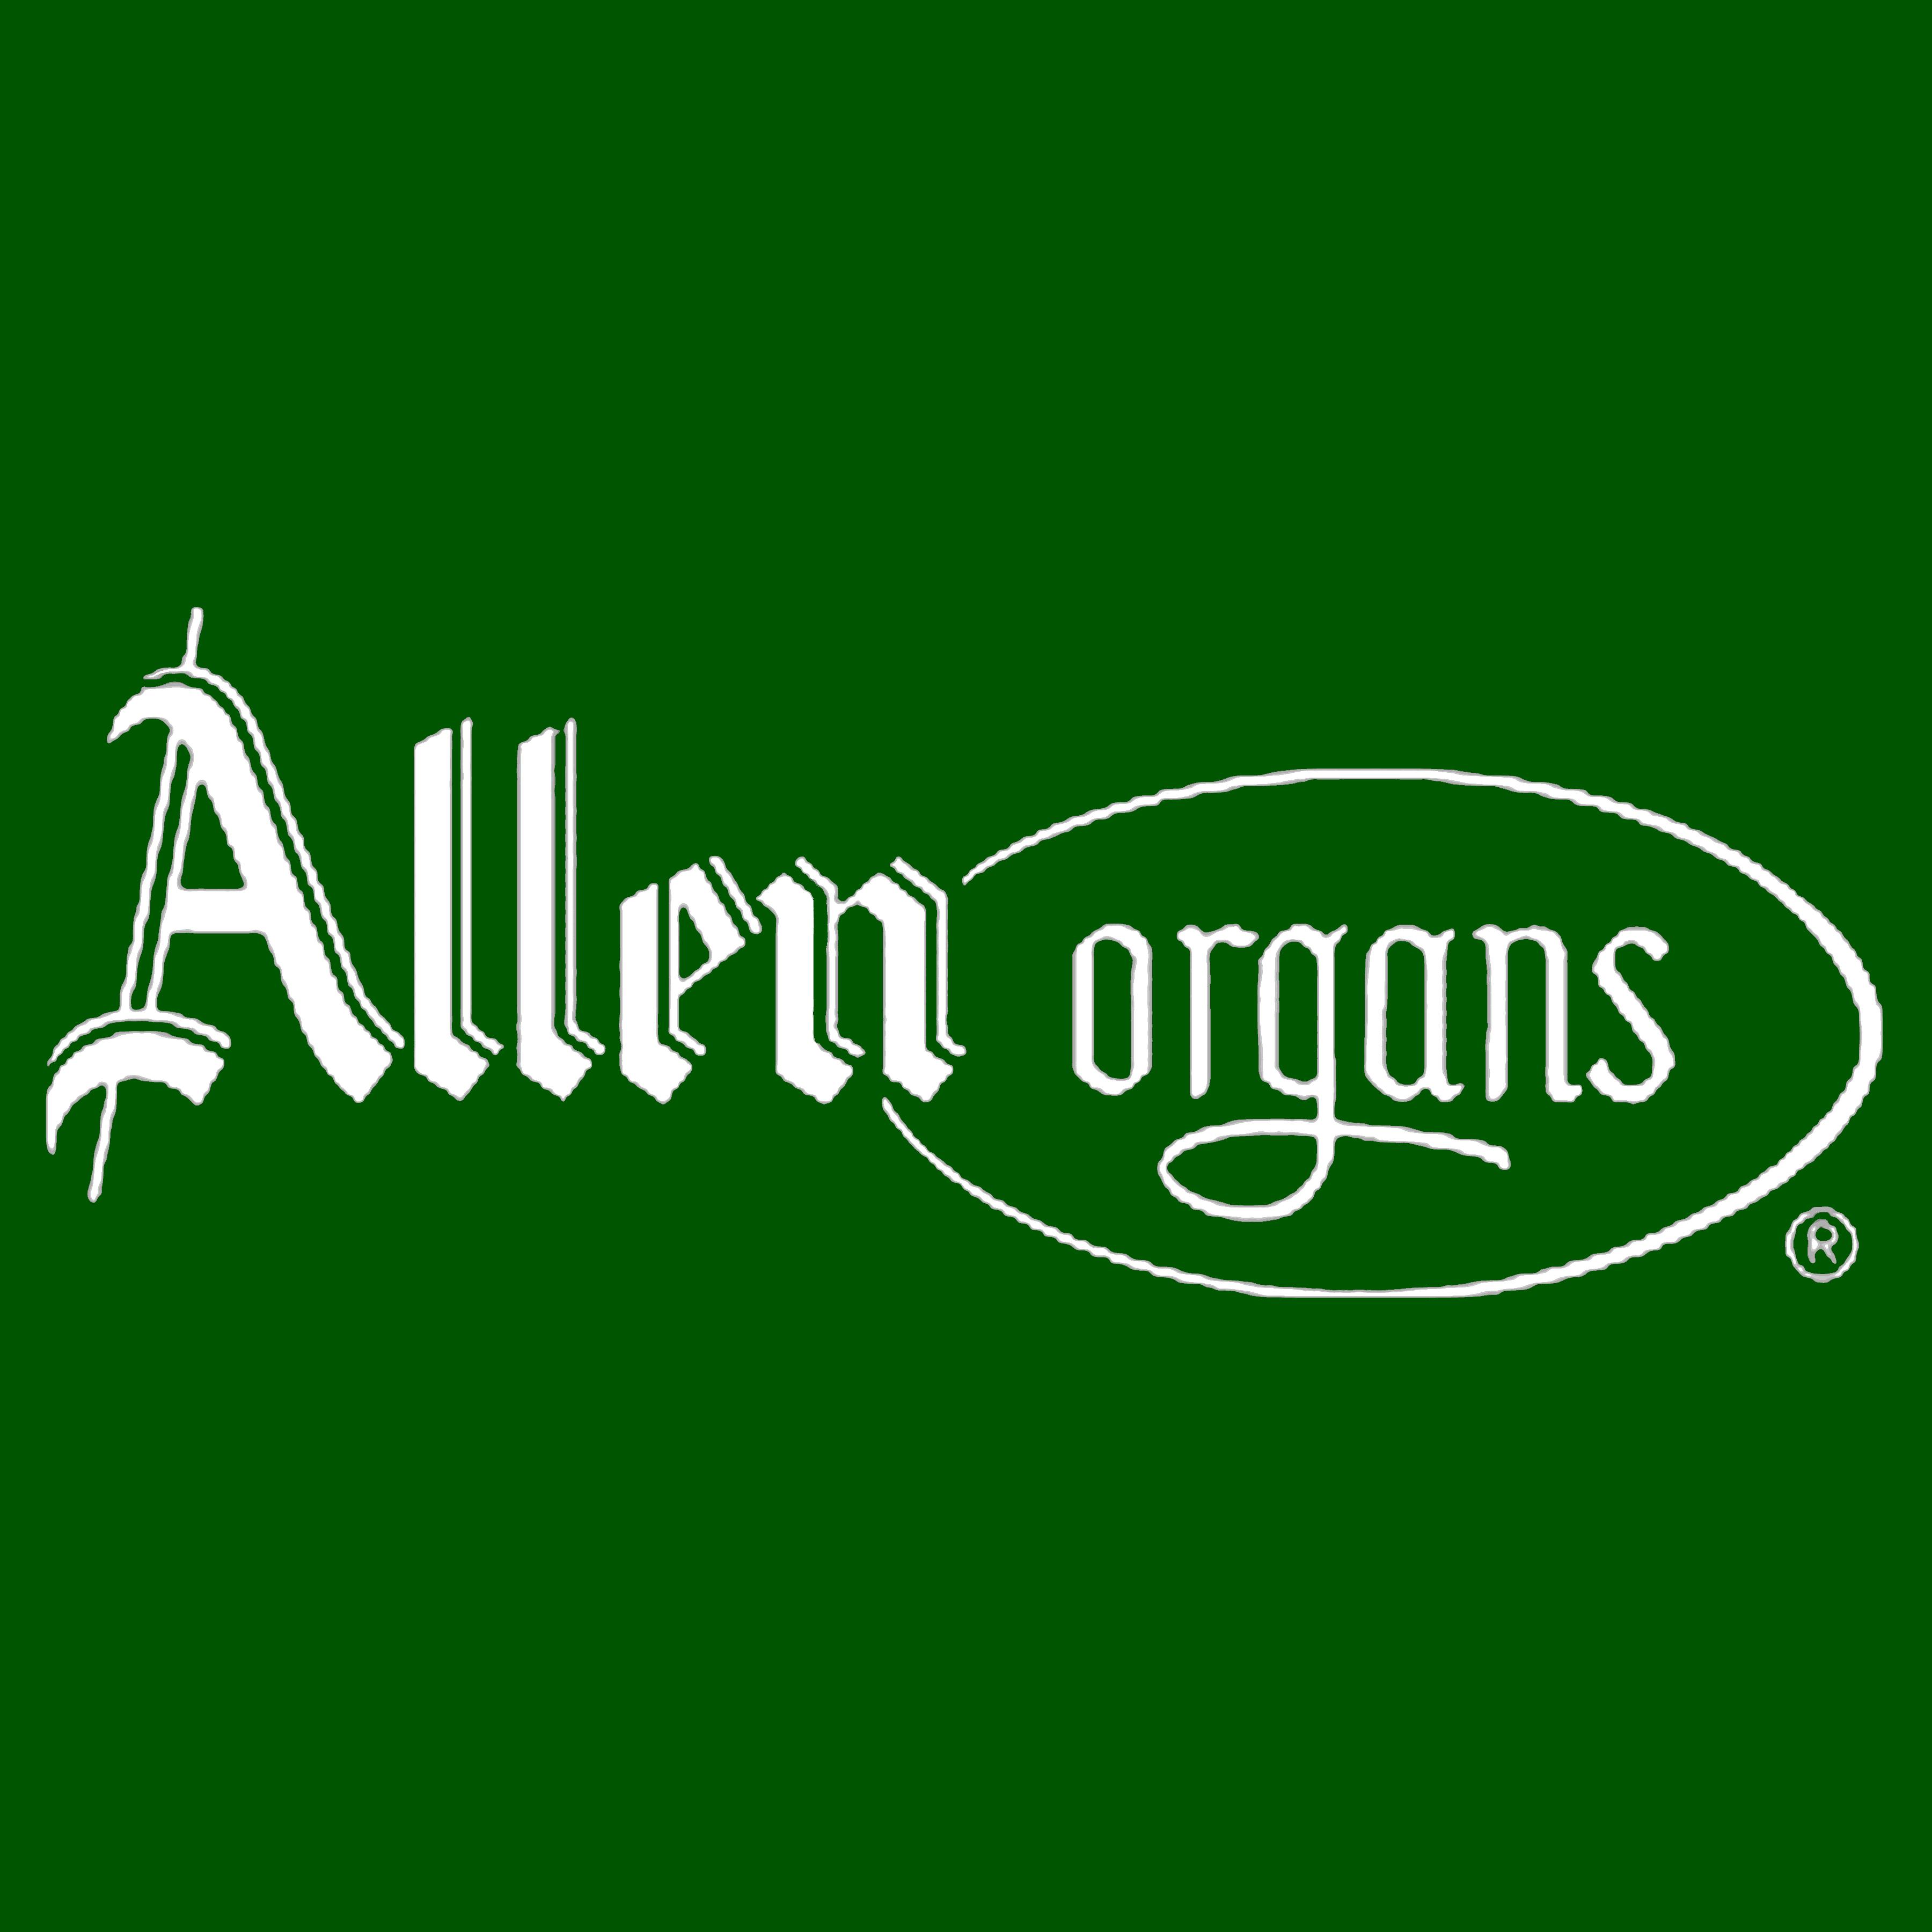 Allen Digital Computer Organ Studios (WA)